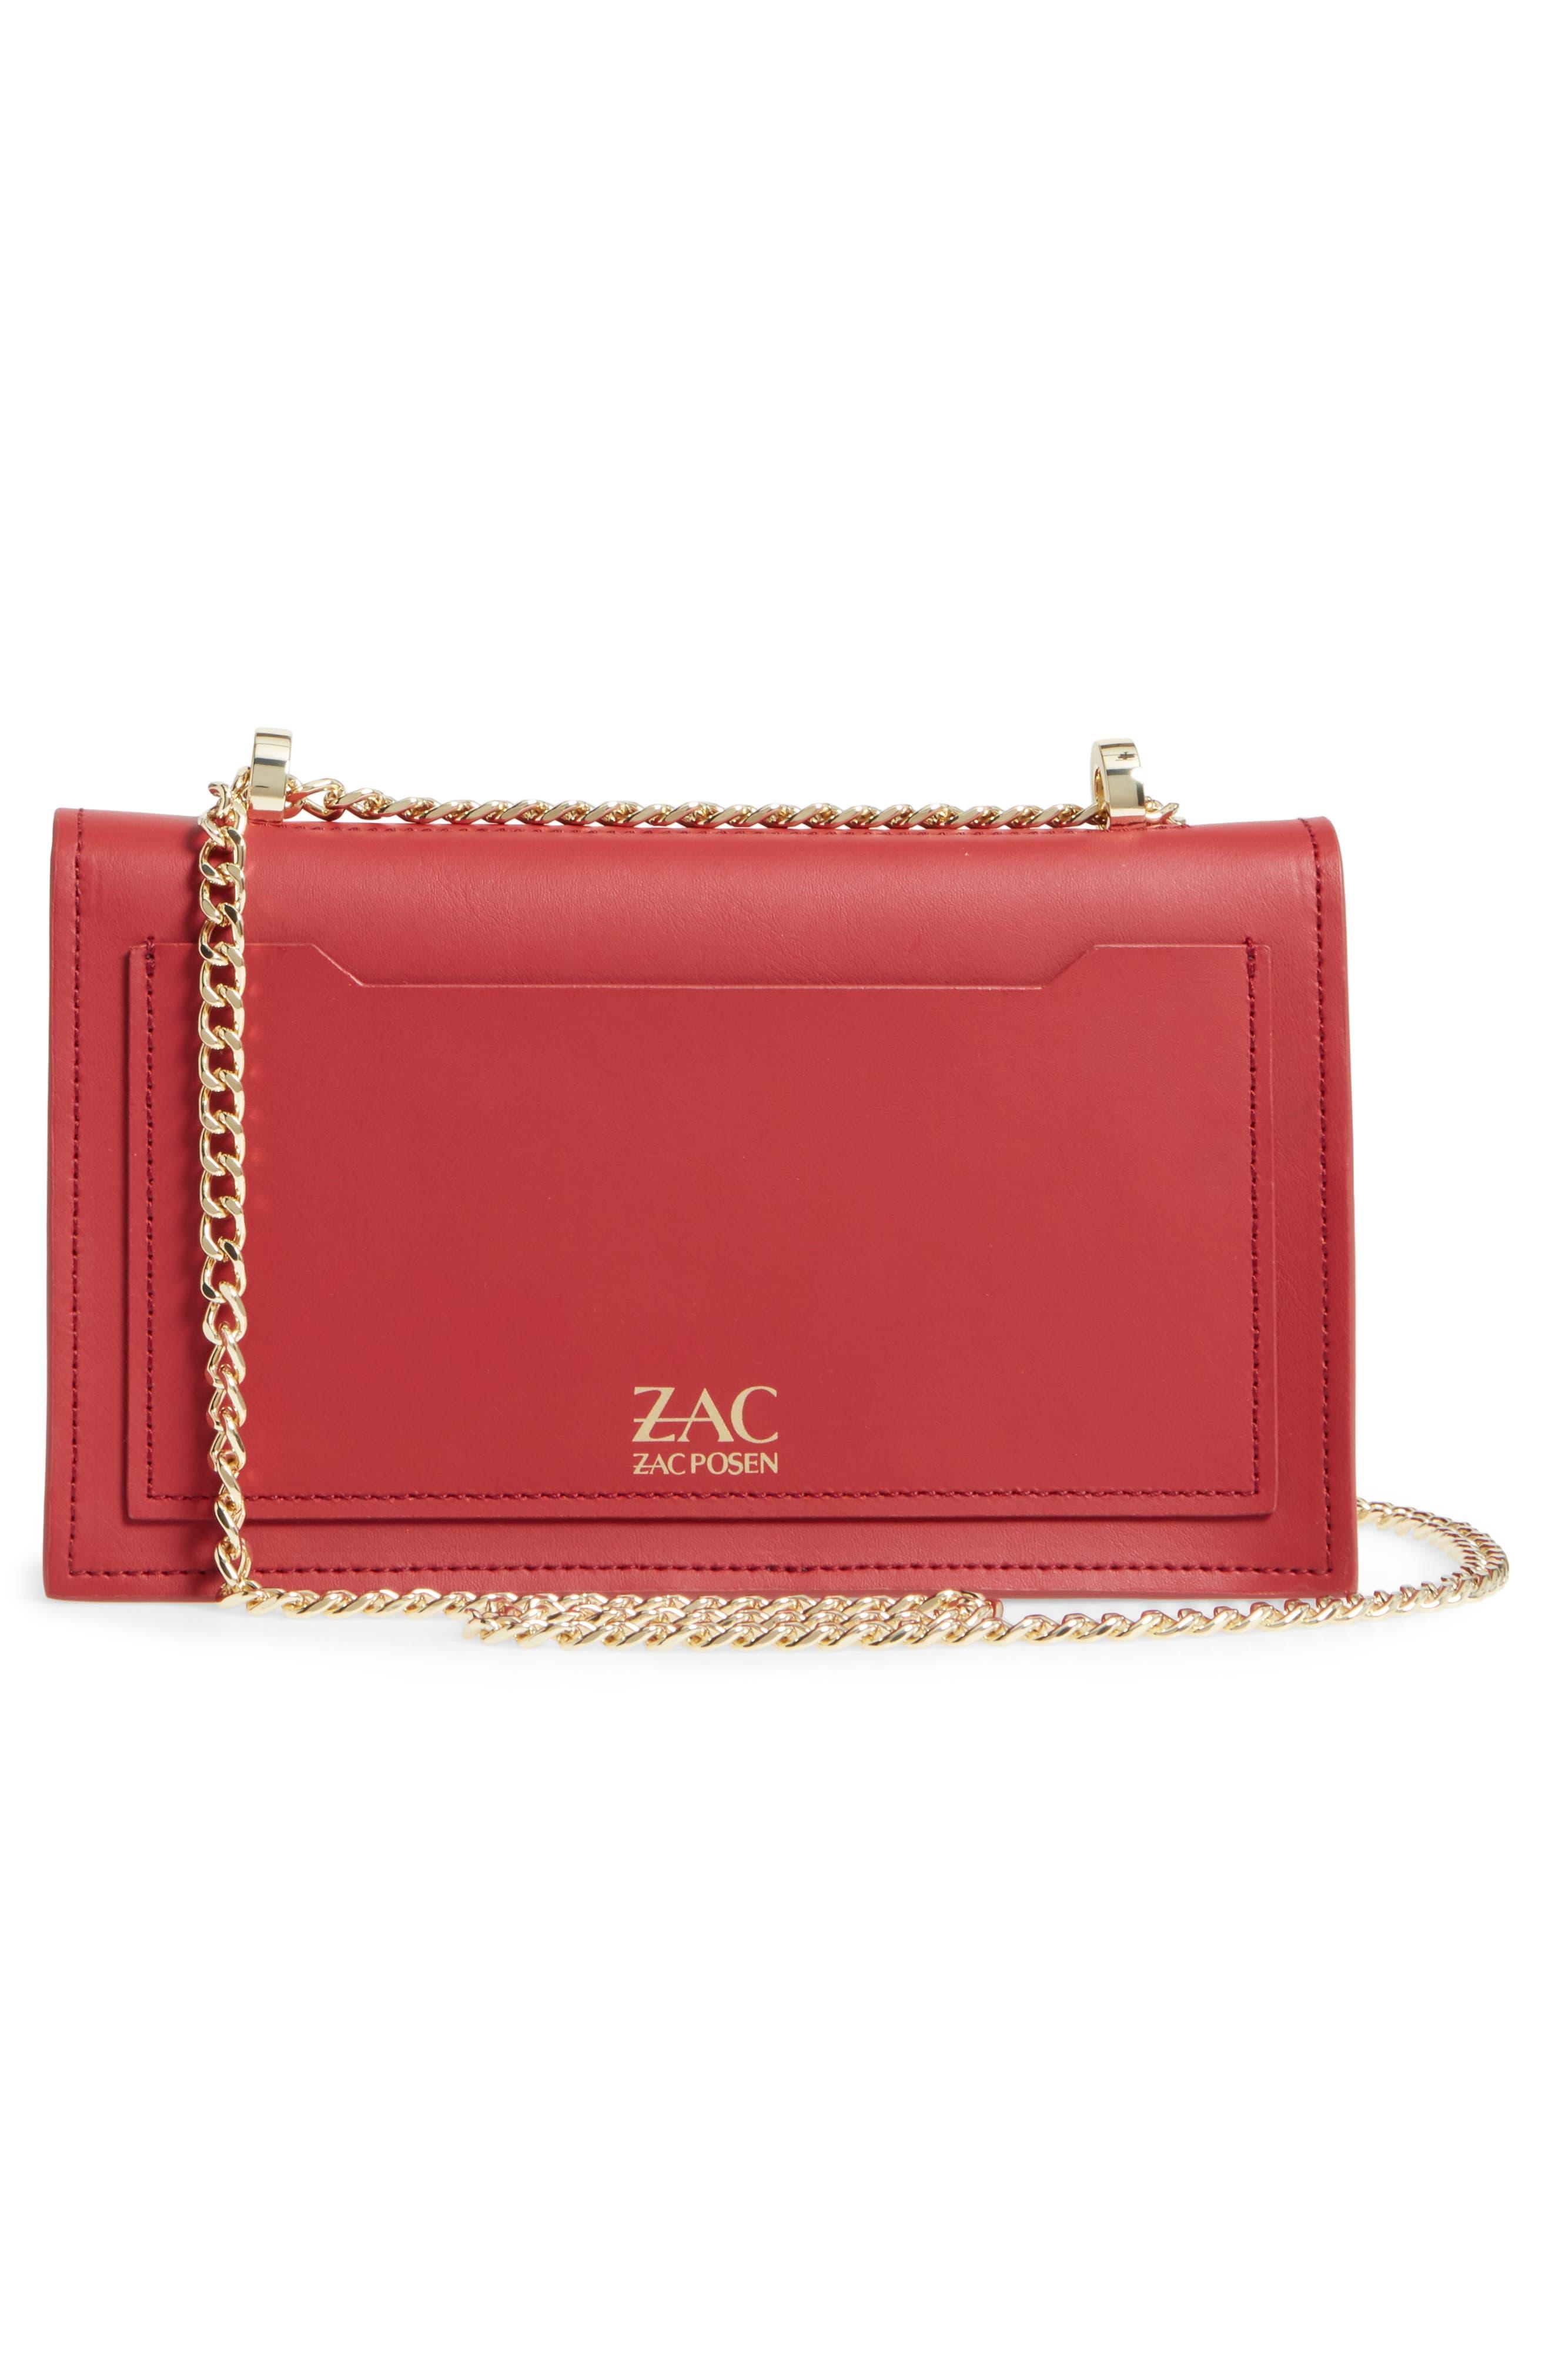 ZAC Zac Posen Earthette Leather Accordion Bag,                             Alternate thumbnail 3, color,                             600